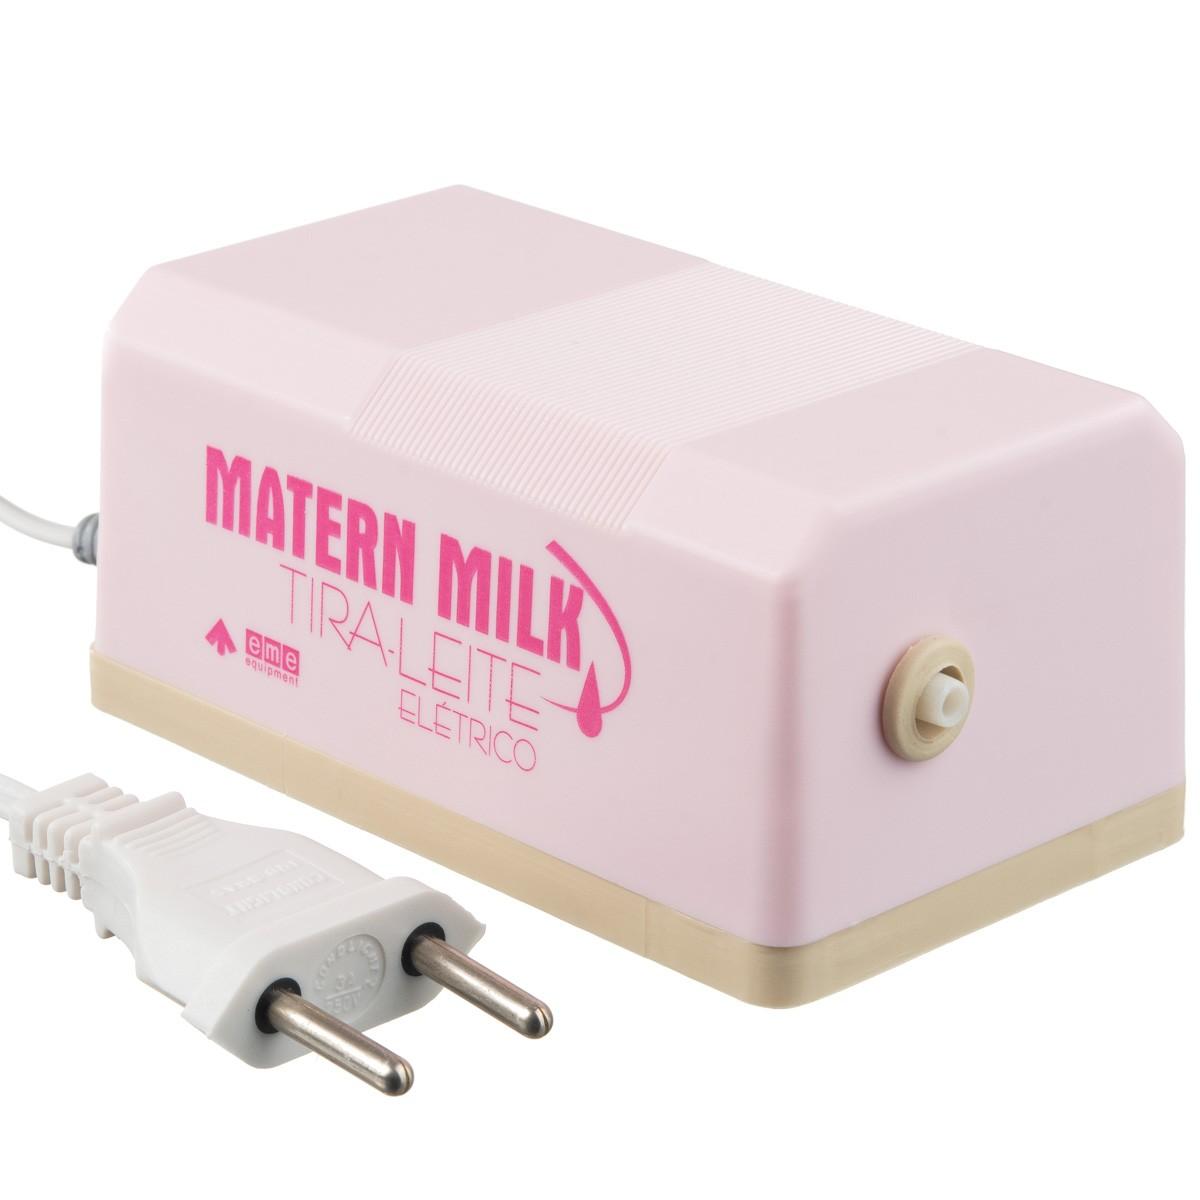 Bomba tira leite elétrico 220 V Rosa - Matern Milk +5 Copos